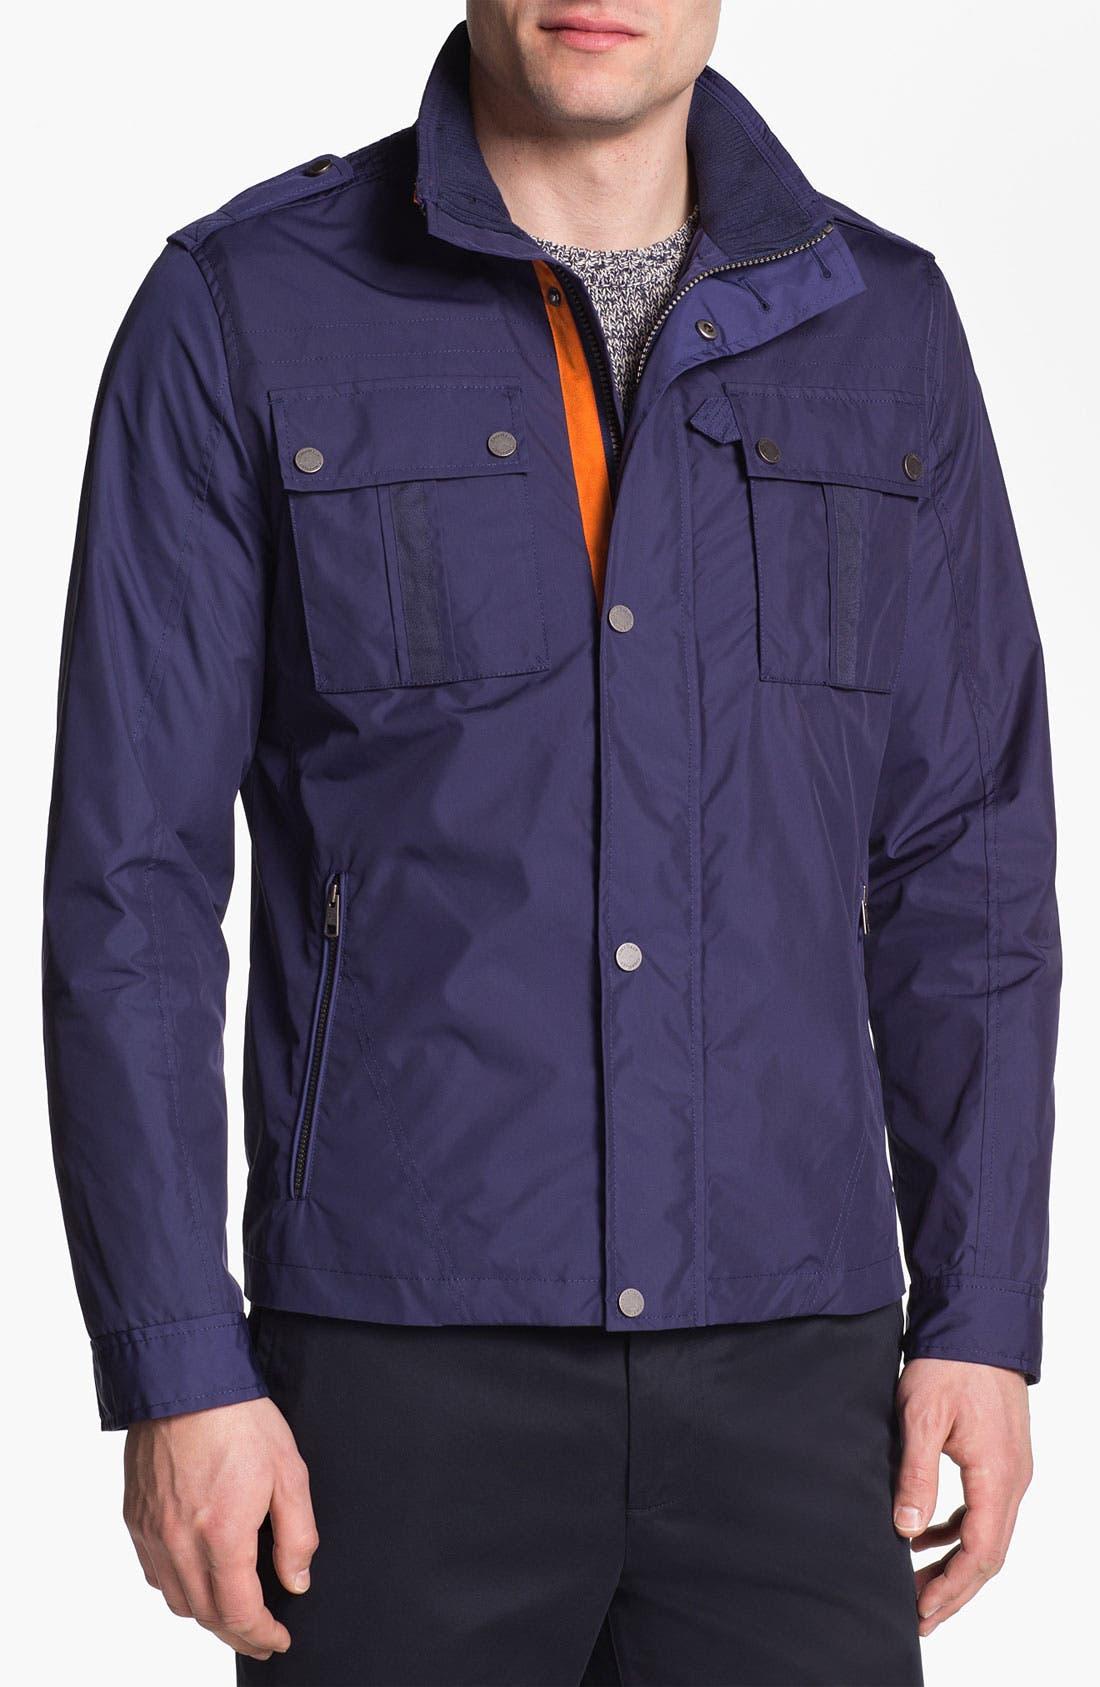 Main Image - Cole Haan Water Resistant Jacket